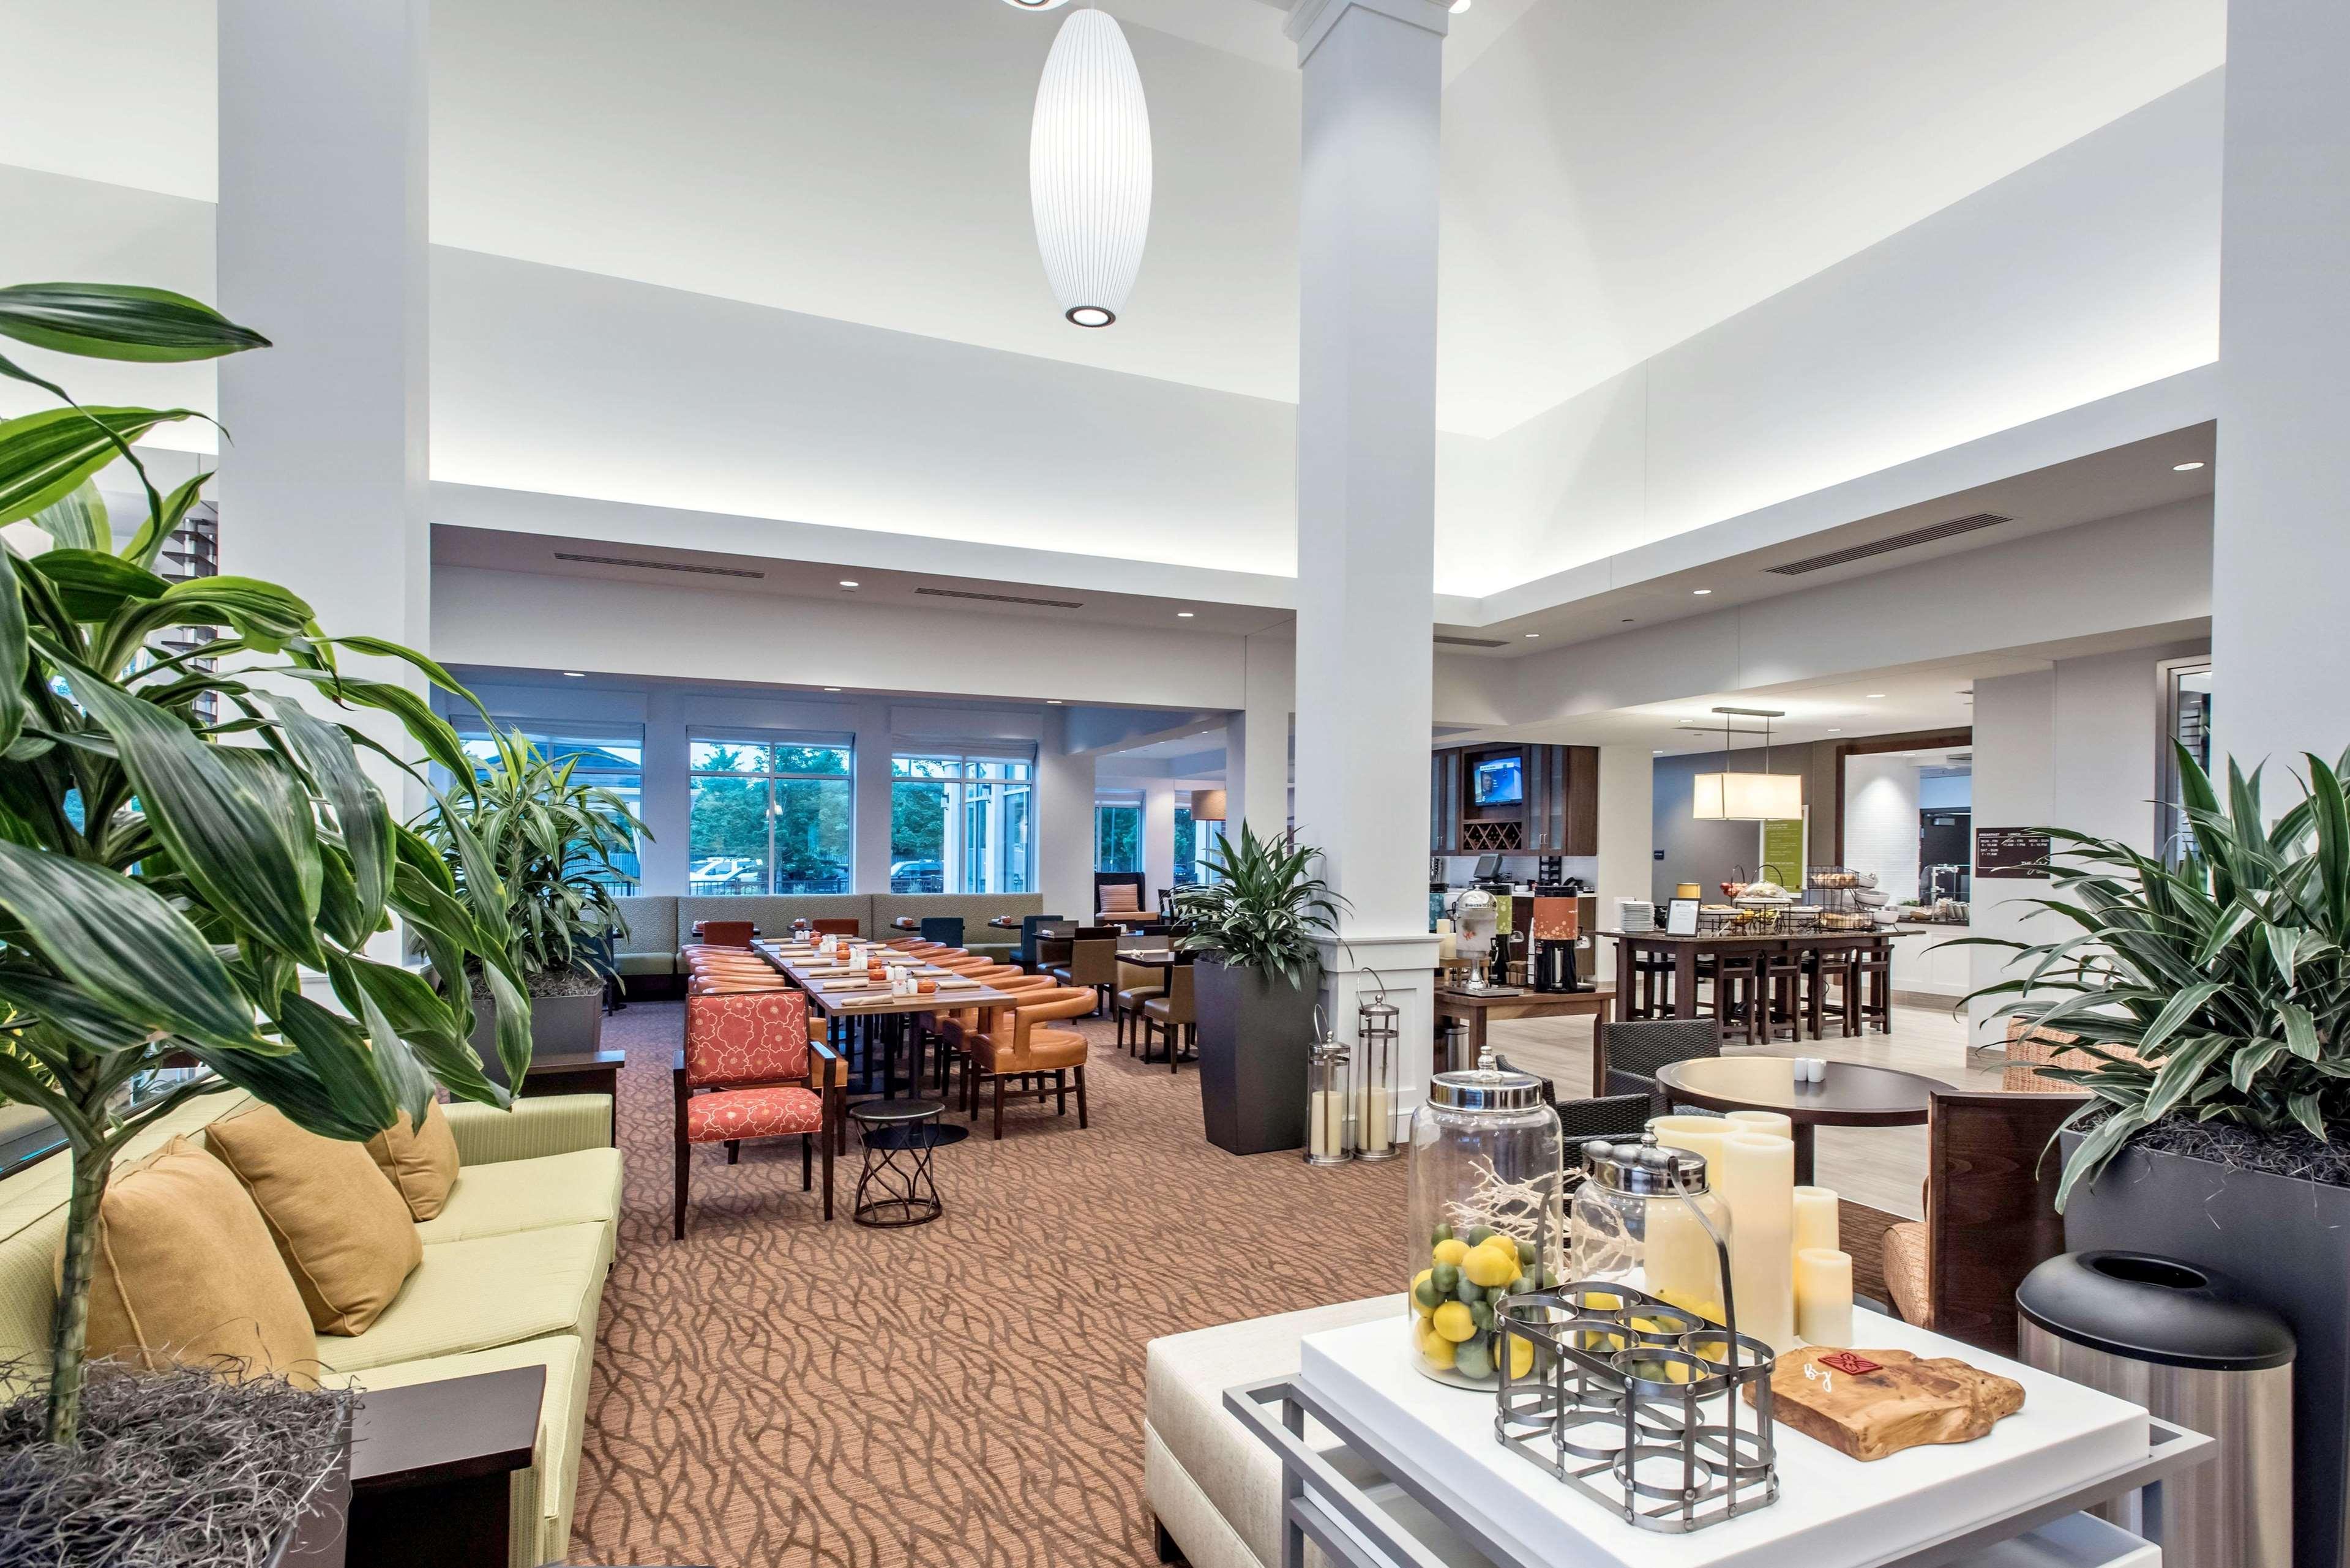 Hilton Garden Inn Minneapolis Airport Mall Of America Coupons Bloomington Mn Near Me 8coupons